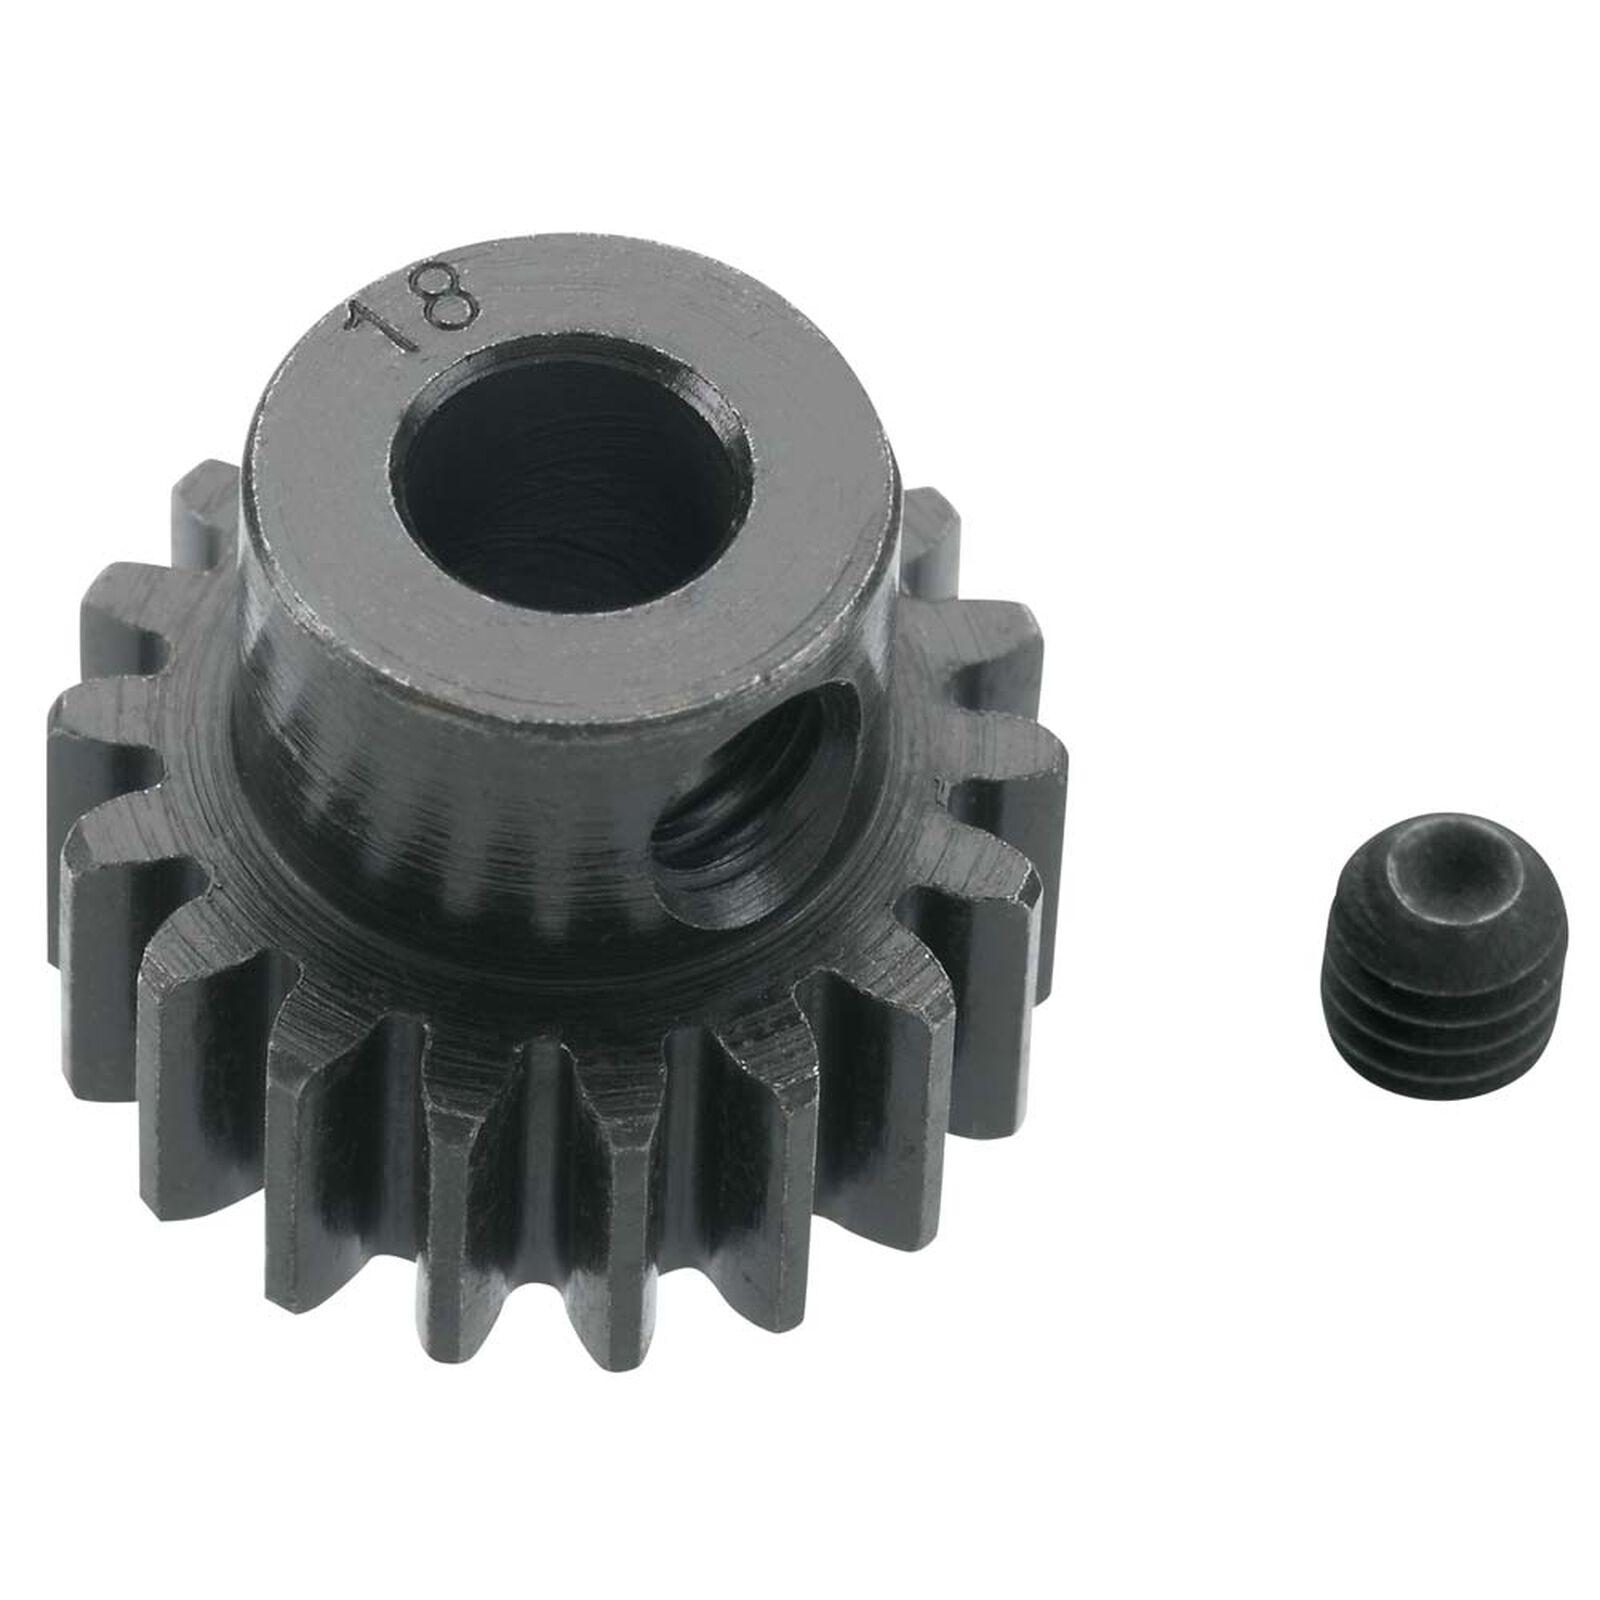 Extra Hard 18 Tooth Blackened Steel 32p Pinion, 5mm